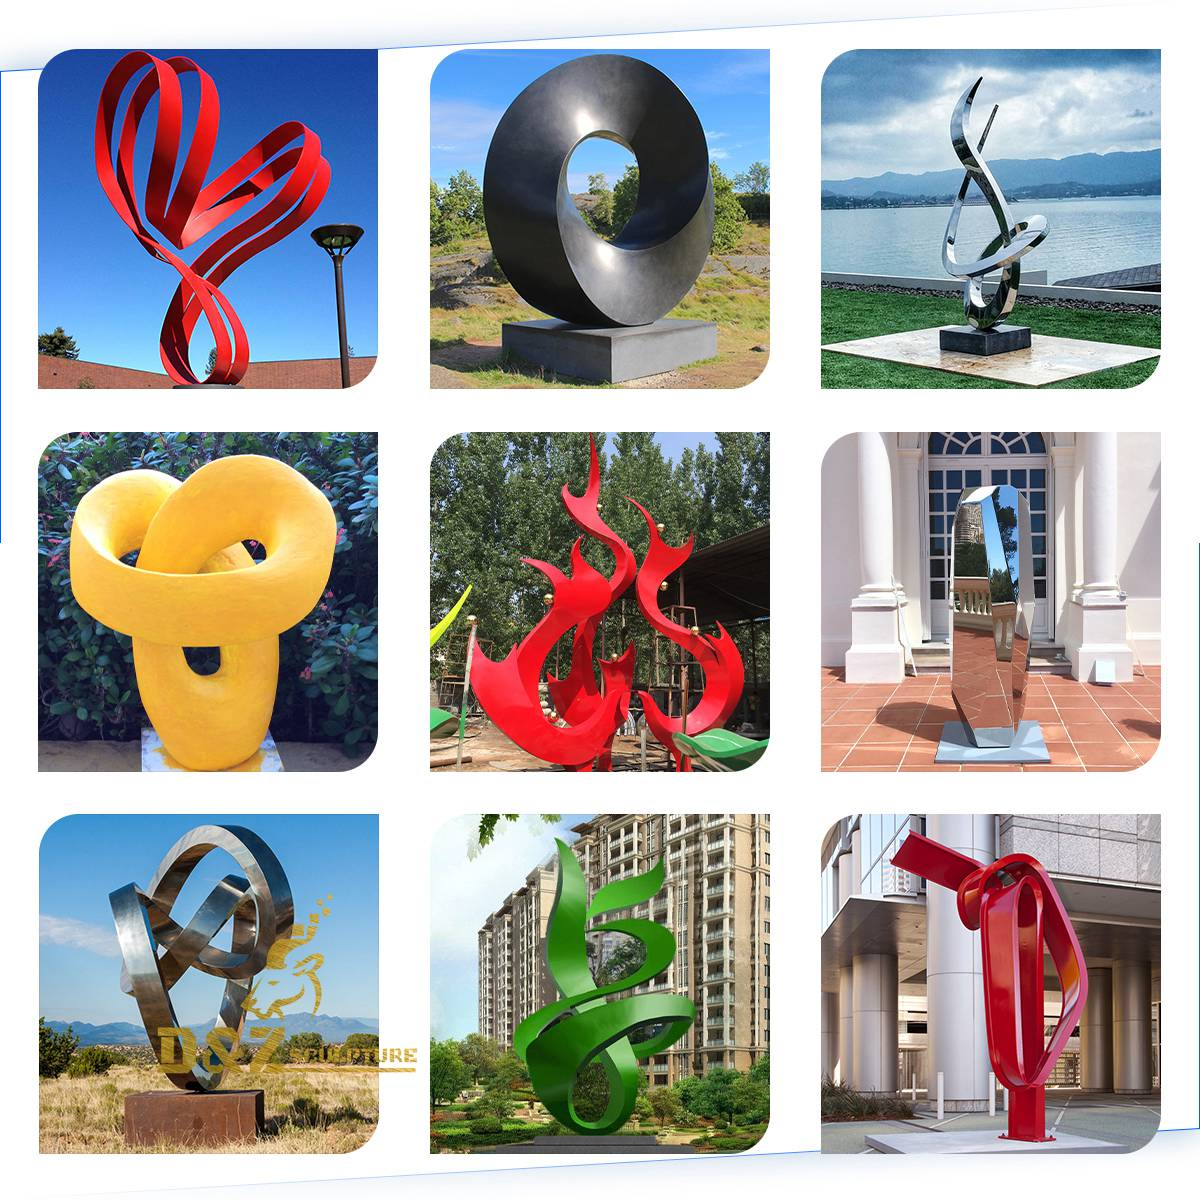 Various stainless steel sculptures